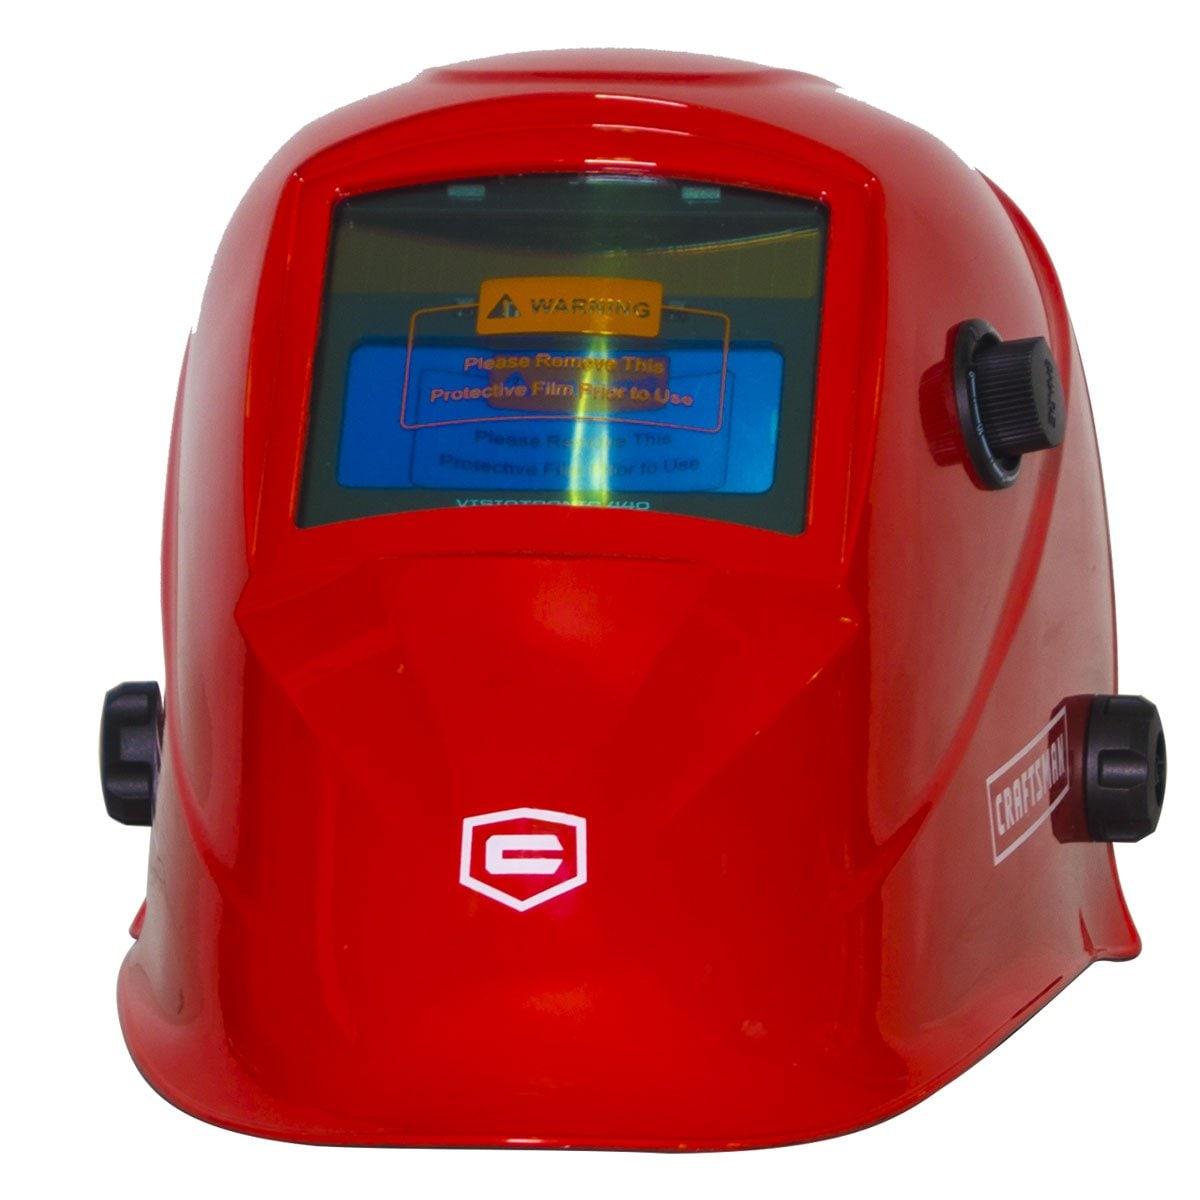 Careta Electrónica Fotosensible para Soldar Visiotronic440 Craftsman Dlvt44